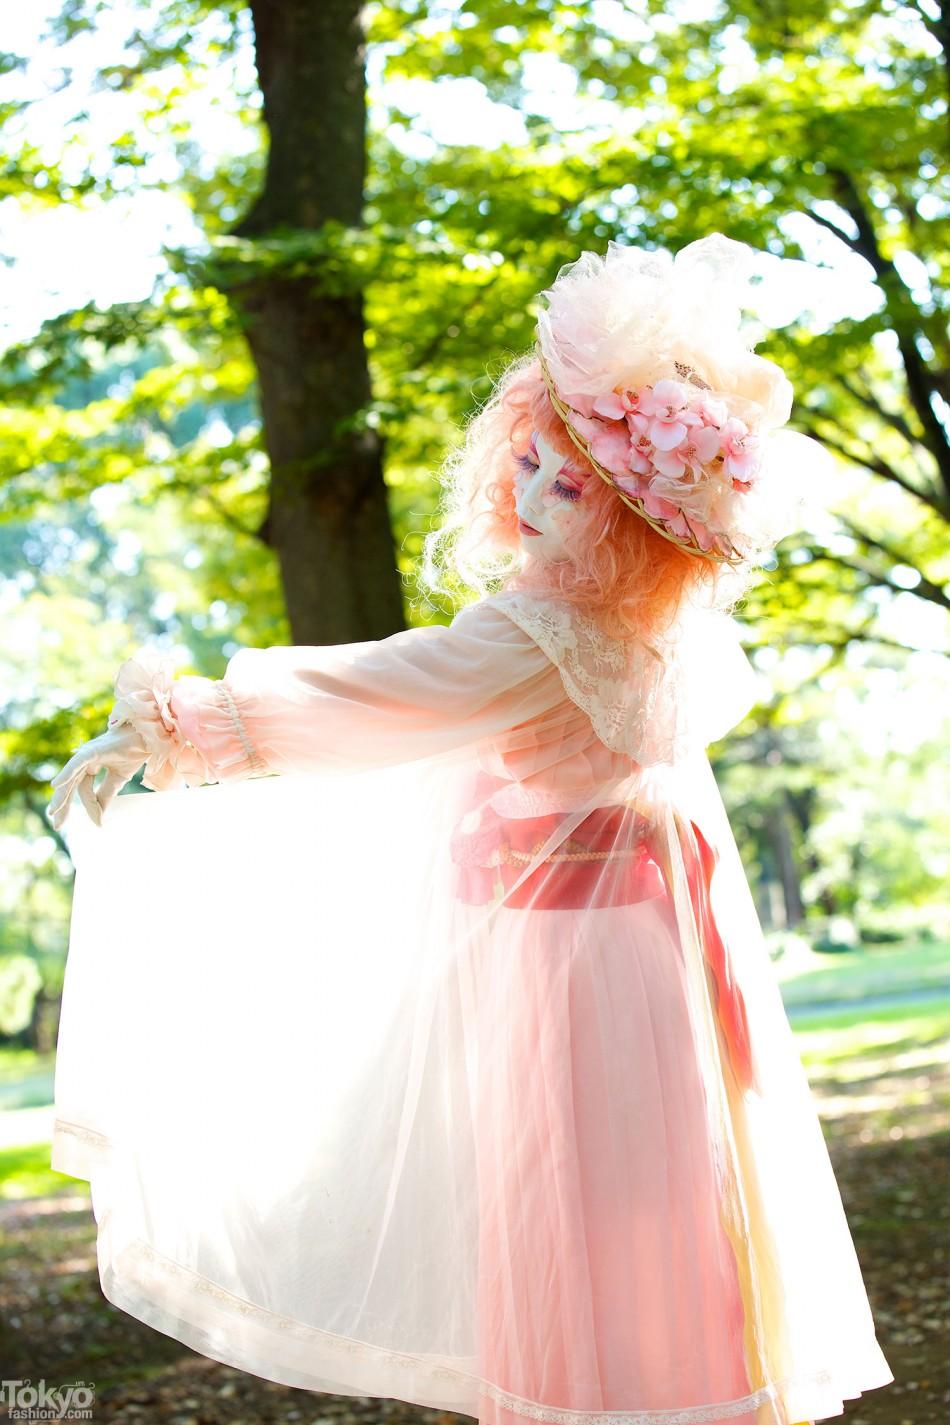 Minori - Her Memories of a Dream (48)